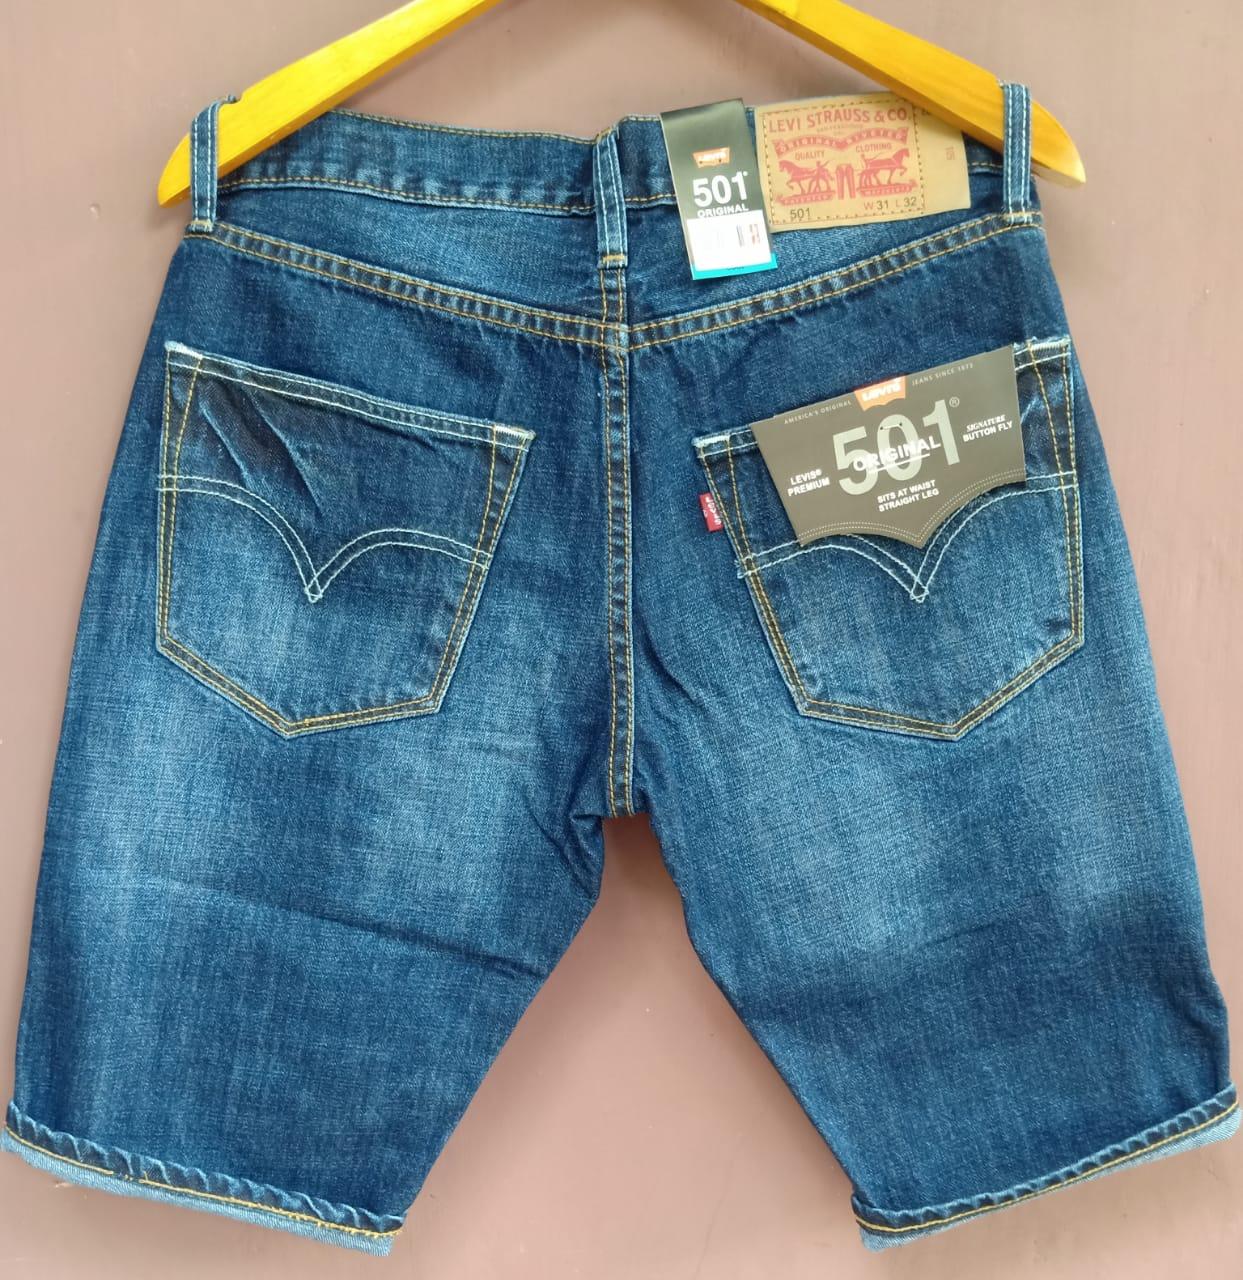 has celana levis 501 // celana pendek levis 501 pria  denim